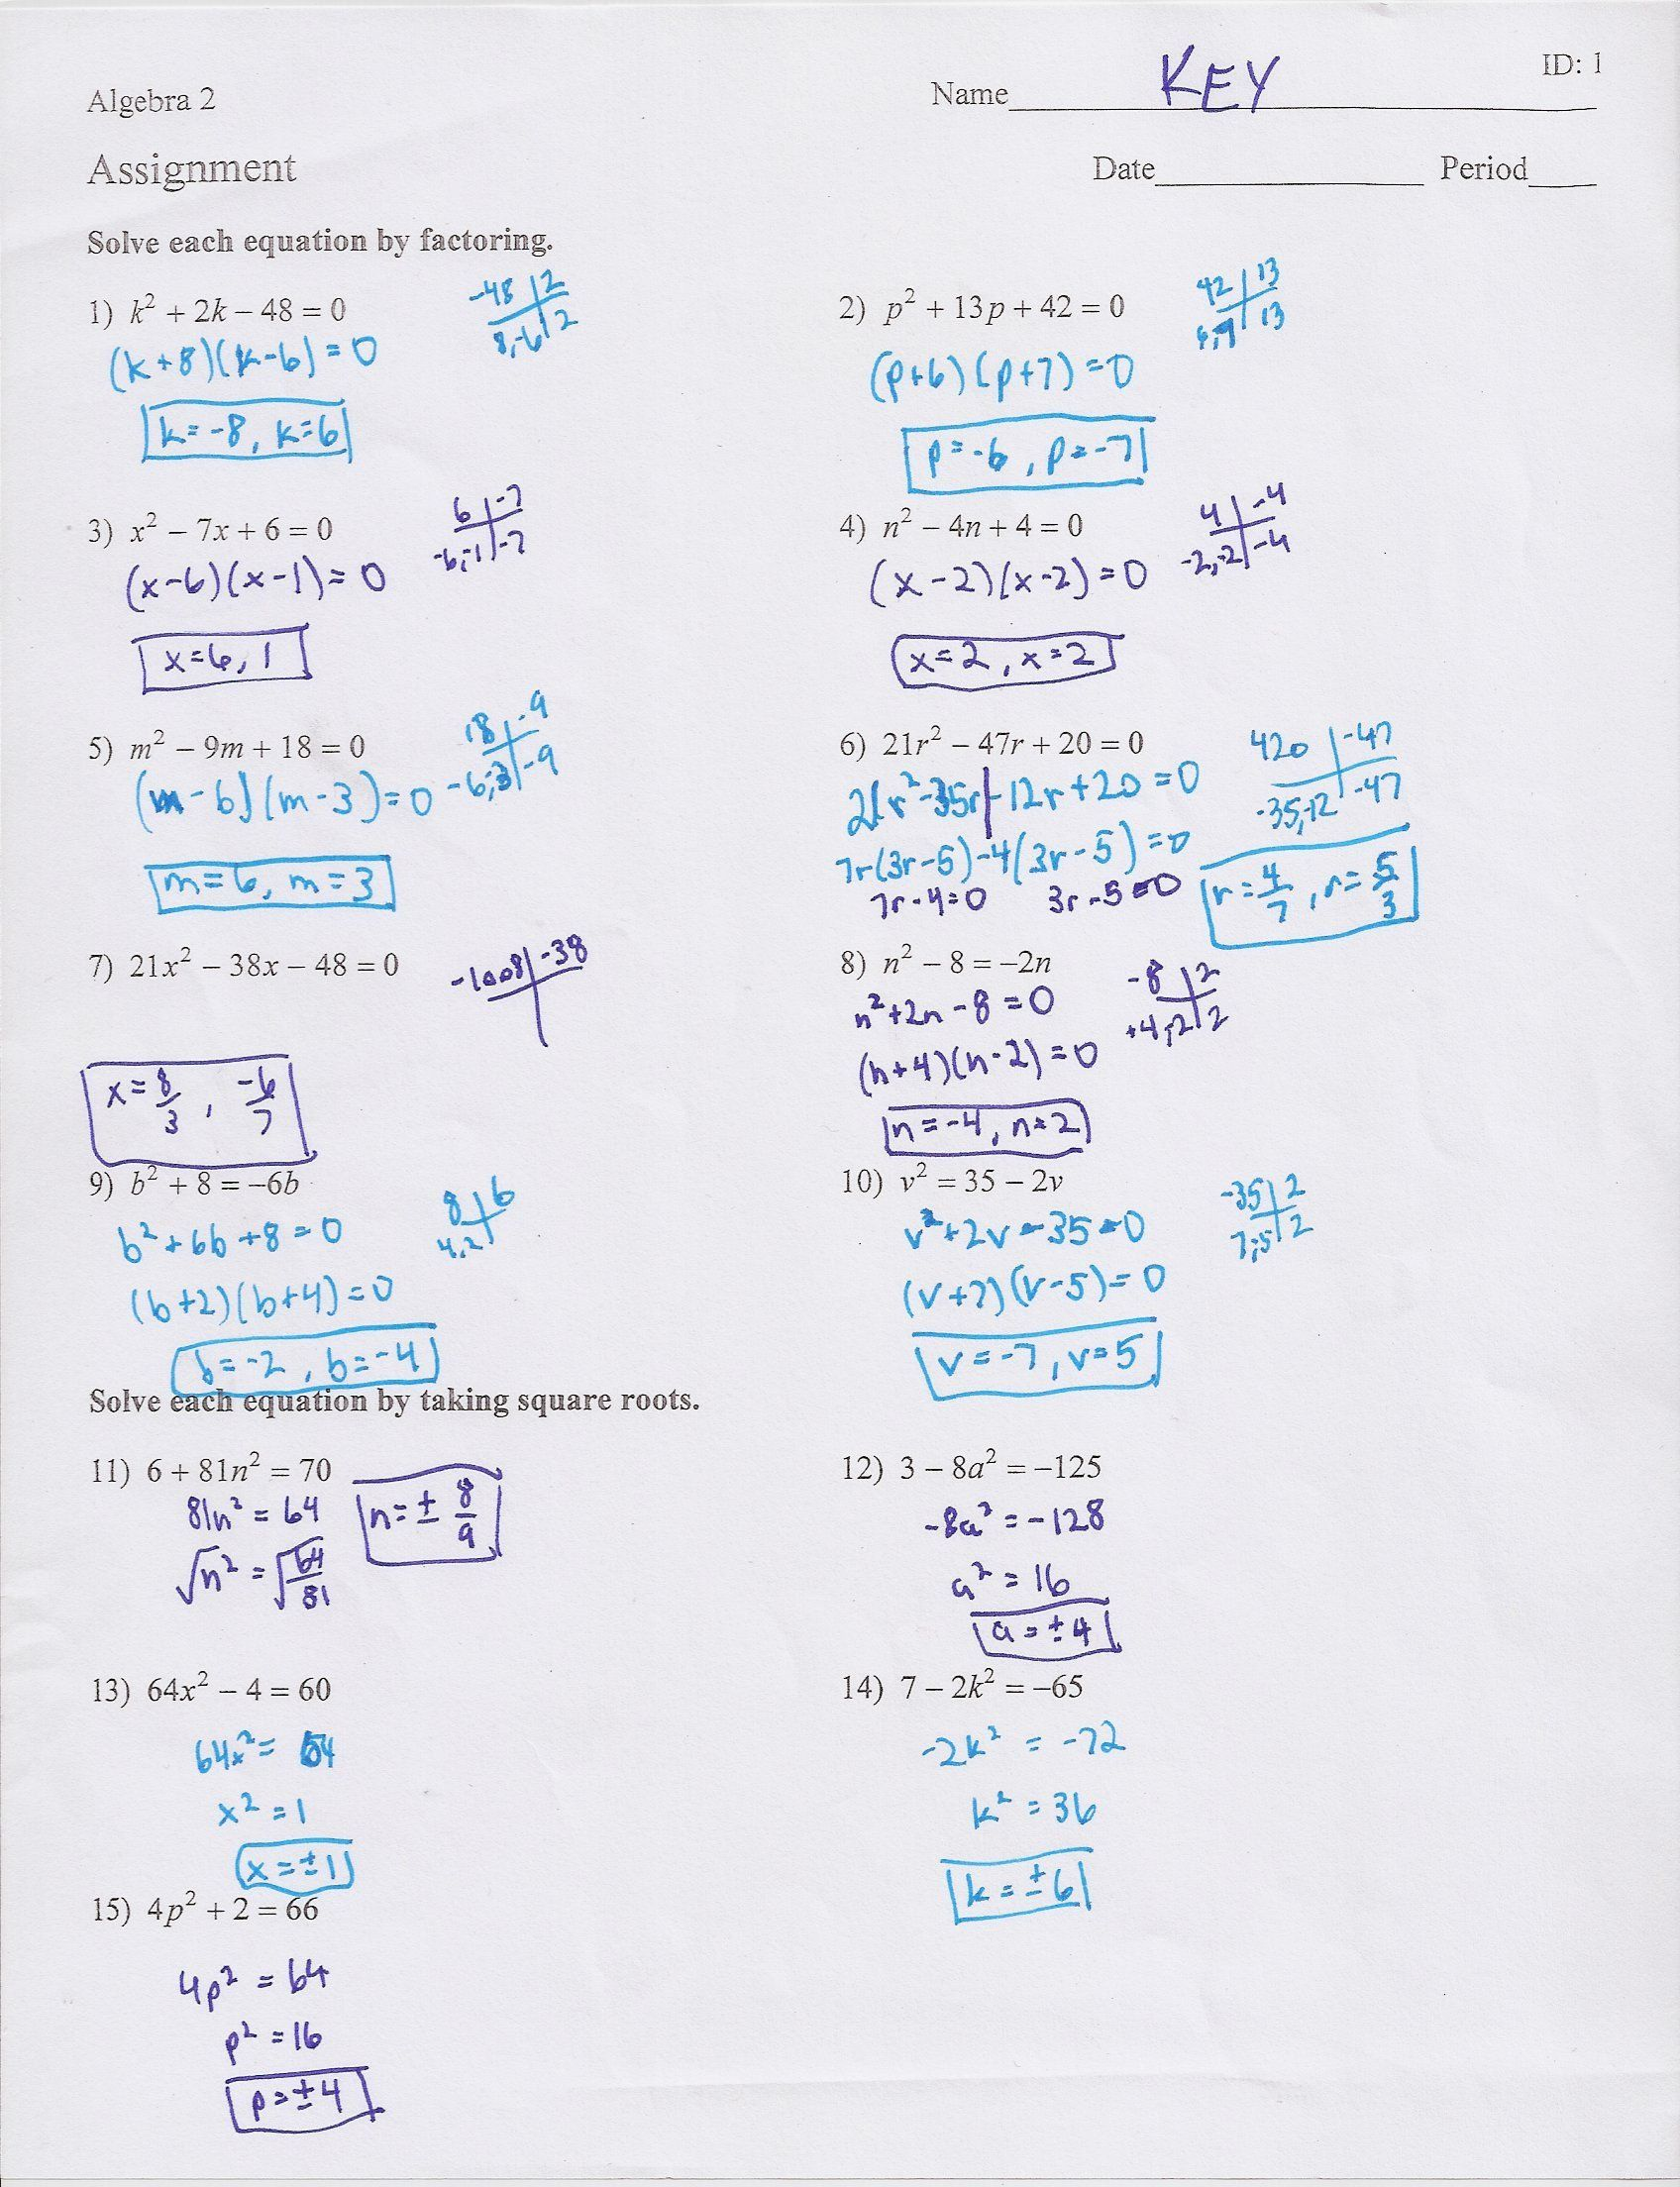 Algebra 2 Factoring Worksheet Solving Quadratic Equations By Factoring Algebra 2 Answer In 2020 Solving Quadratic Equations Quadratics Factoring Polynomials